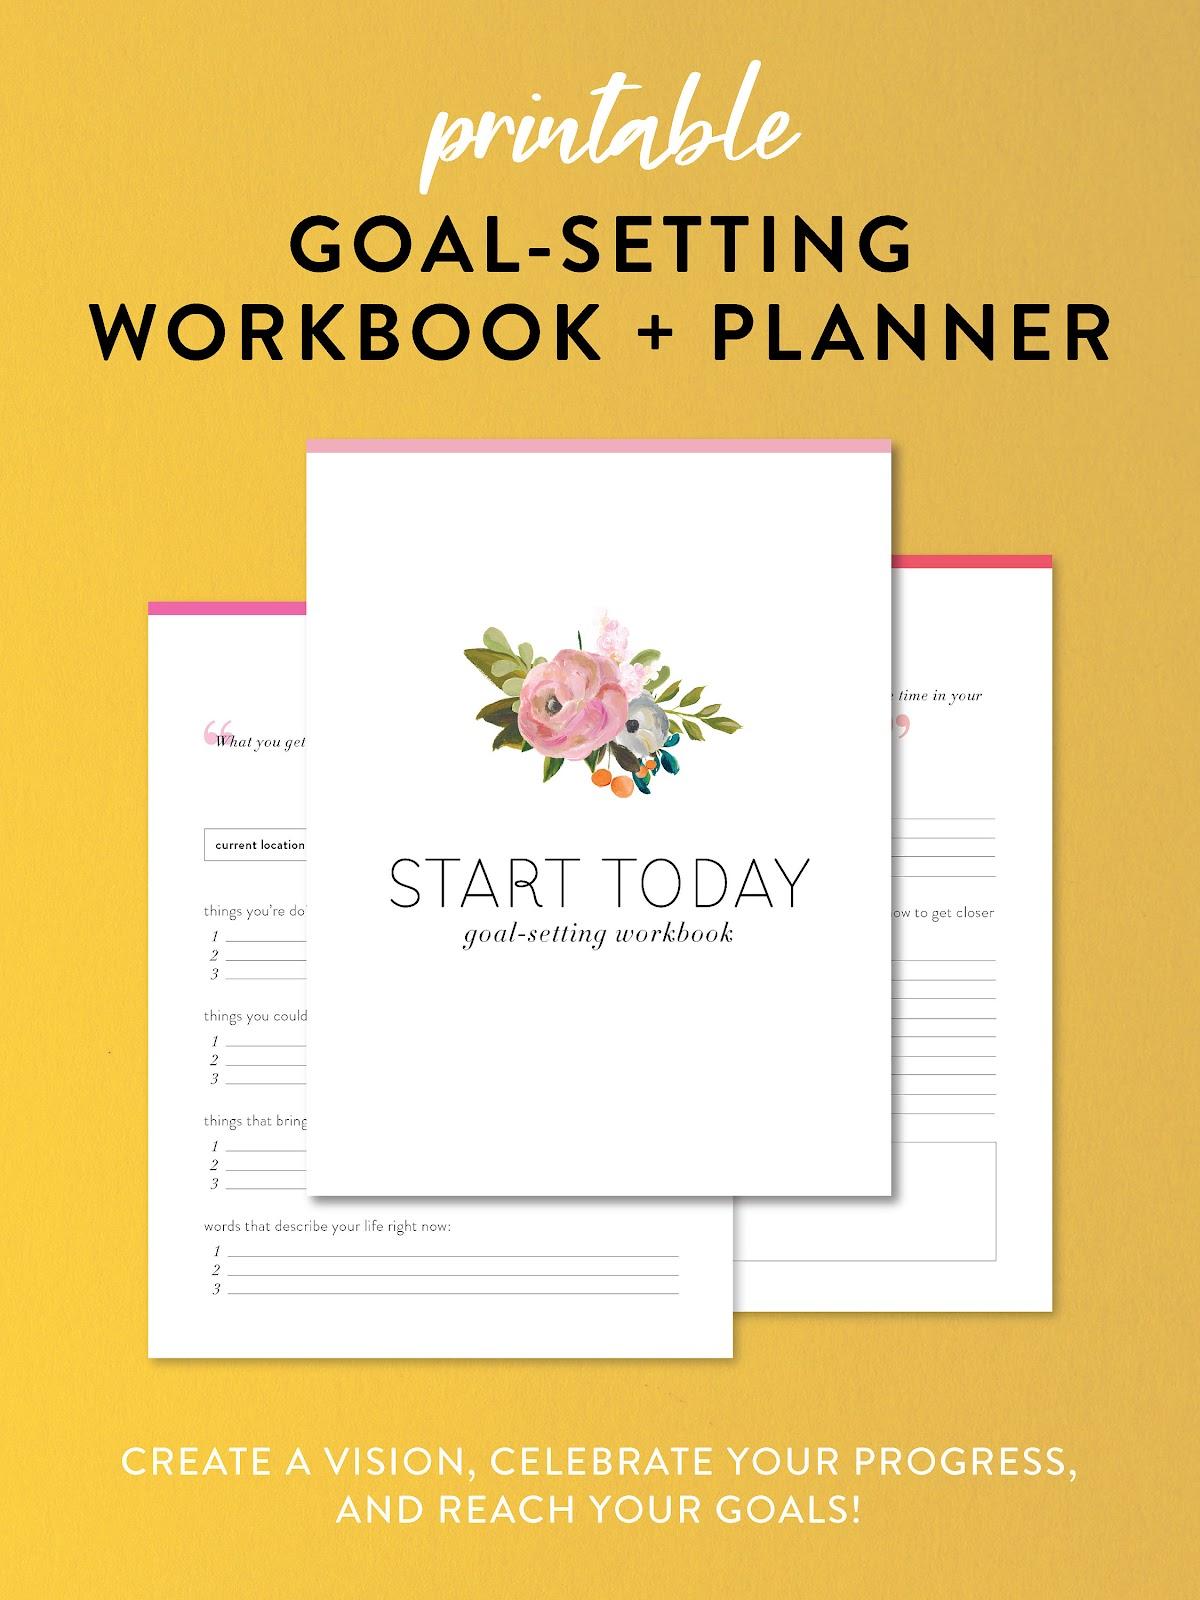 Goal-Setting Workbook + Planner